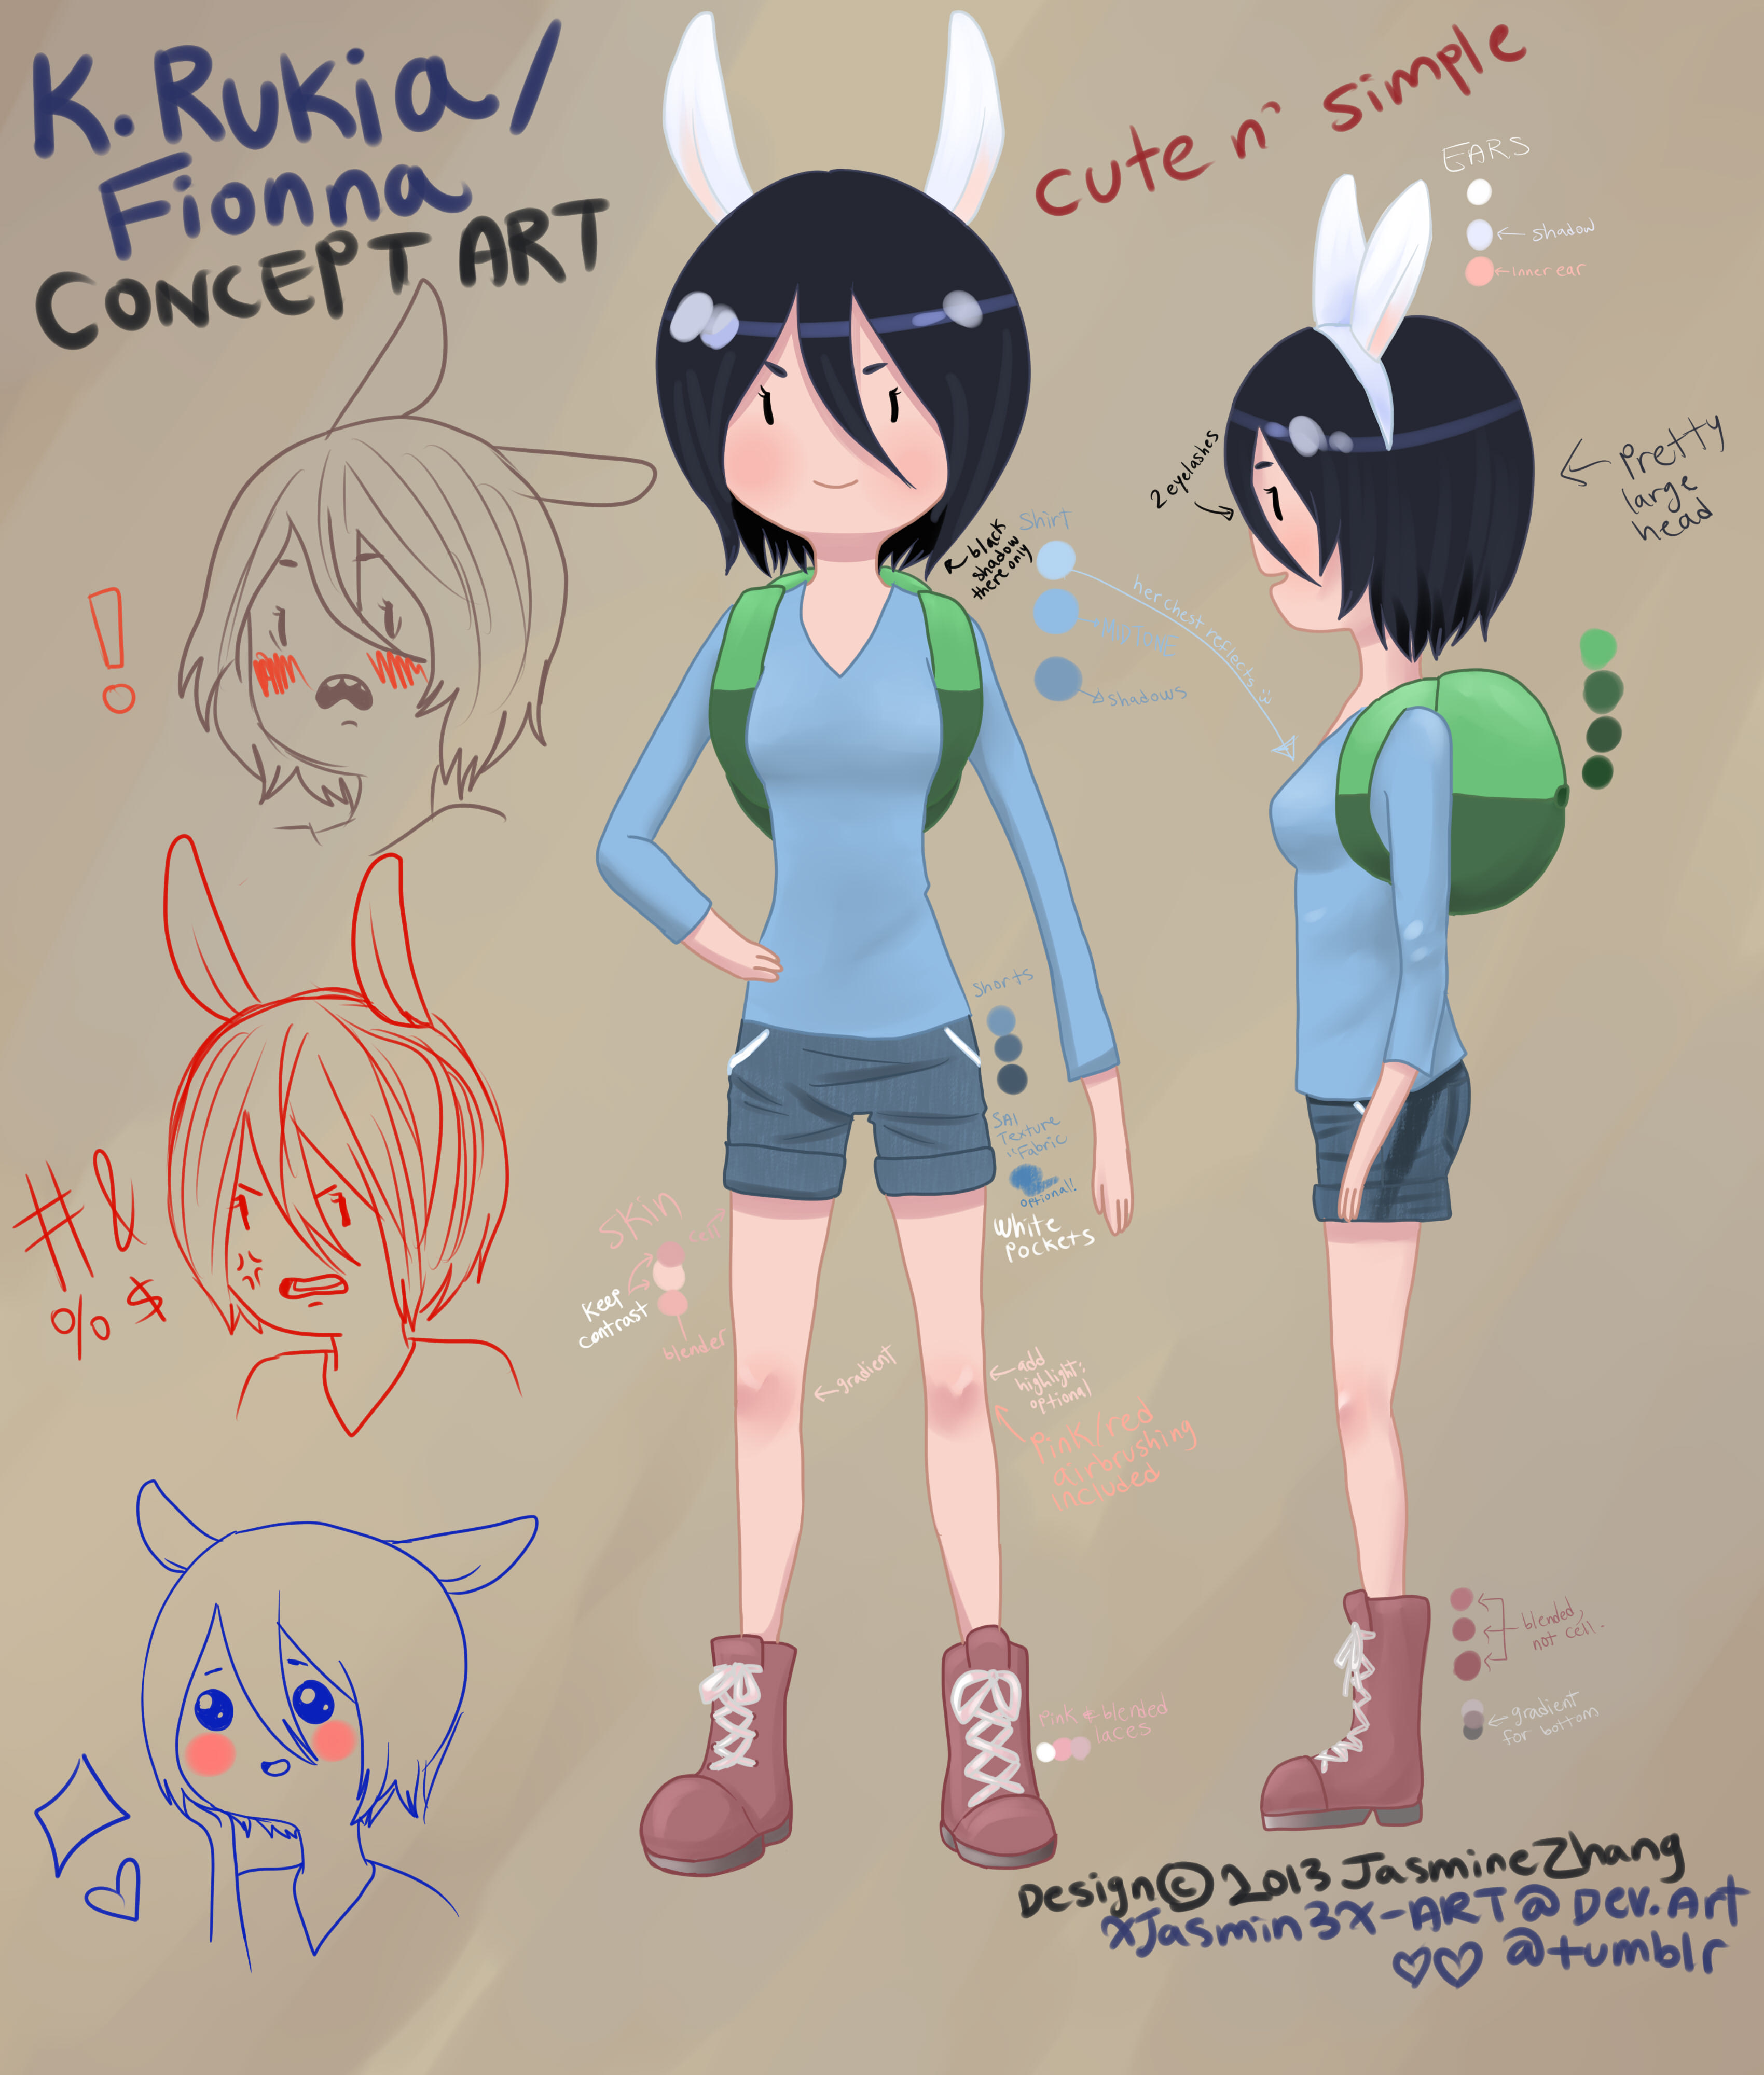 Rukia/Fionna Concept art by Xiaooyu